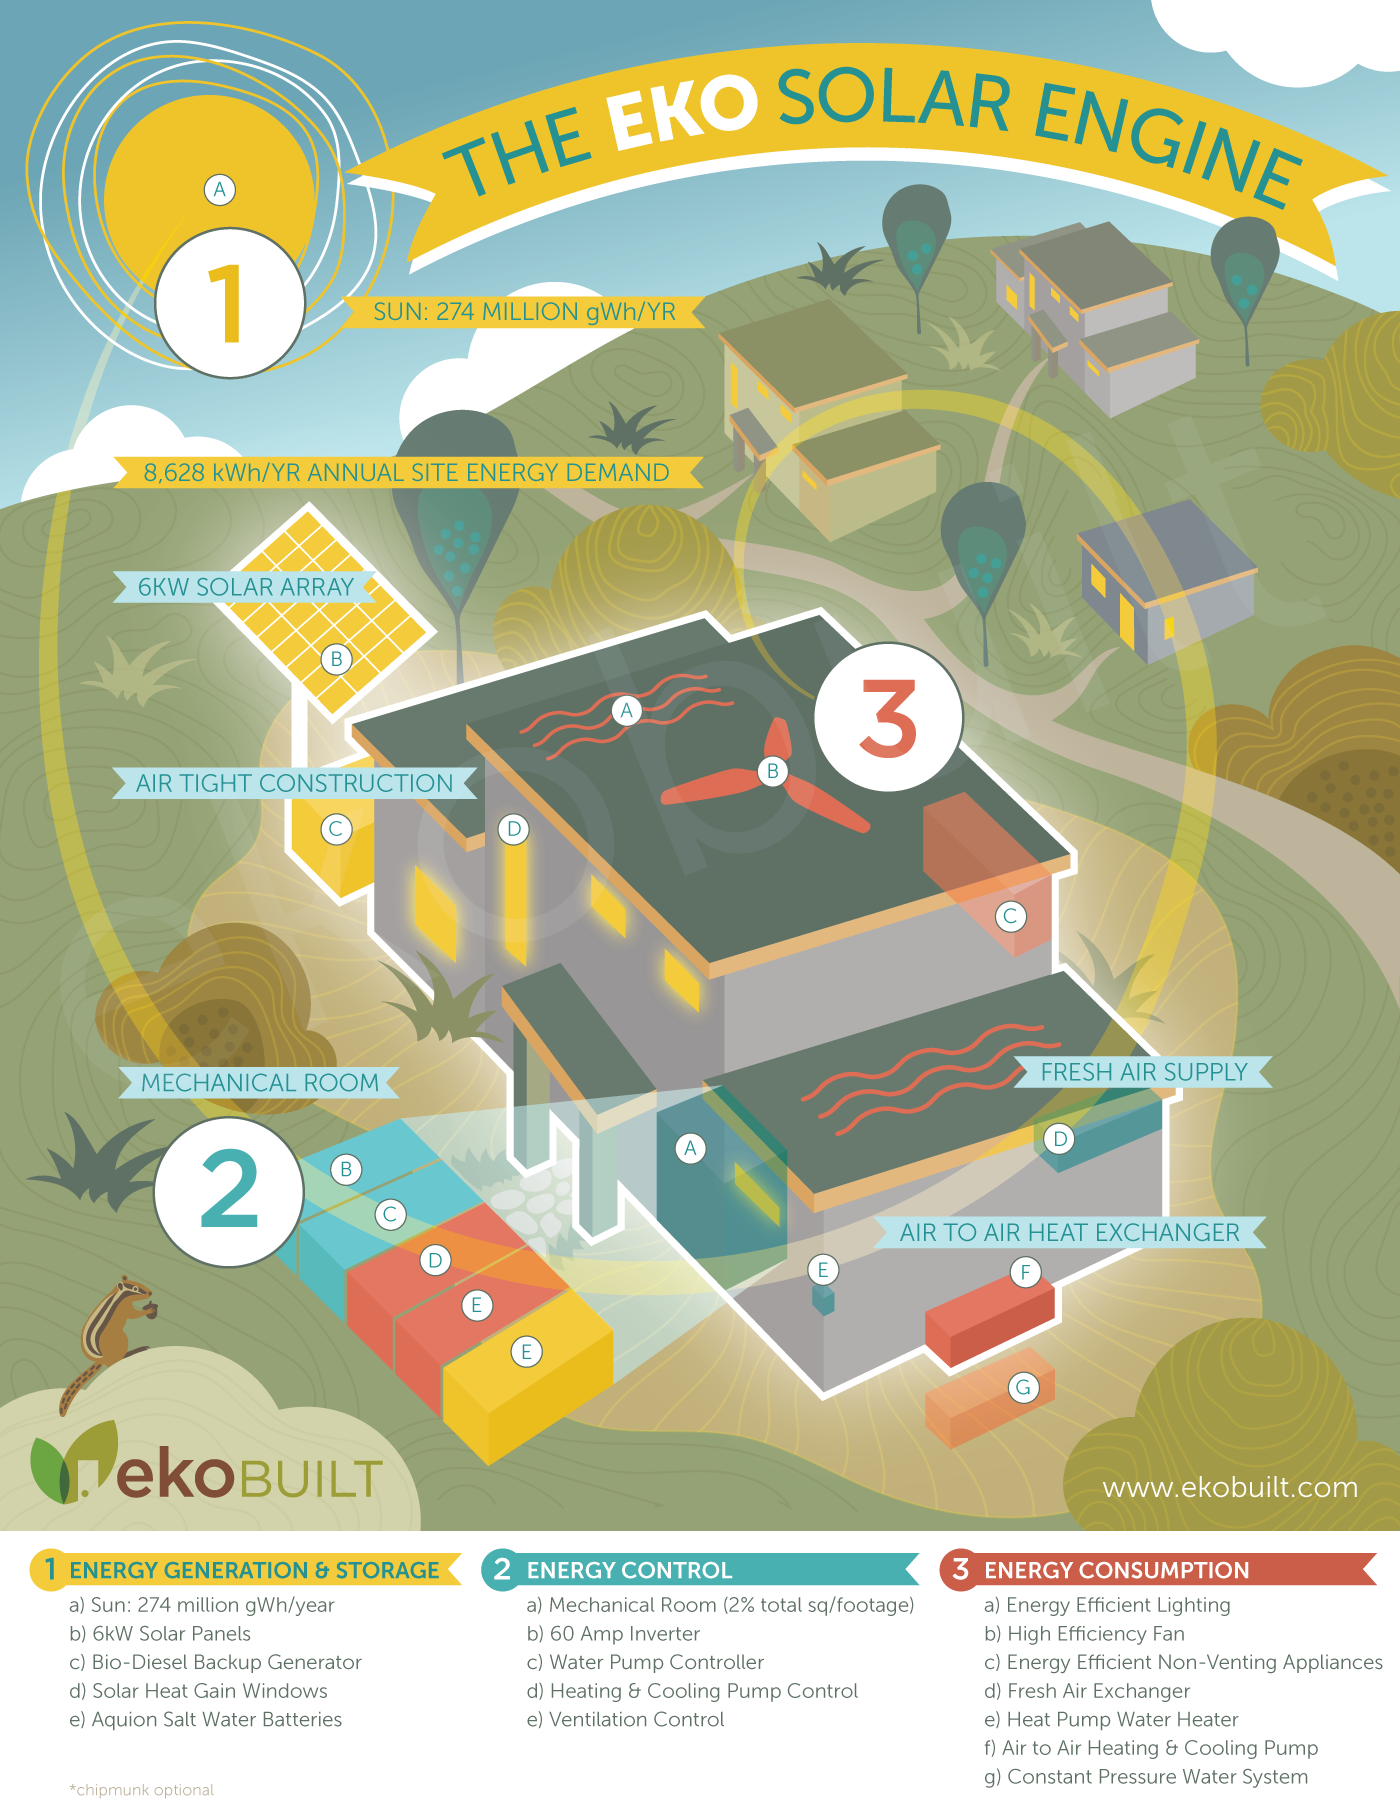 Eko Solar Engine Sumack Loft Salt Water Diagram Ottawa Illustration